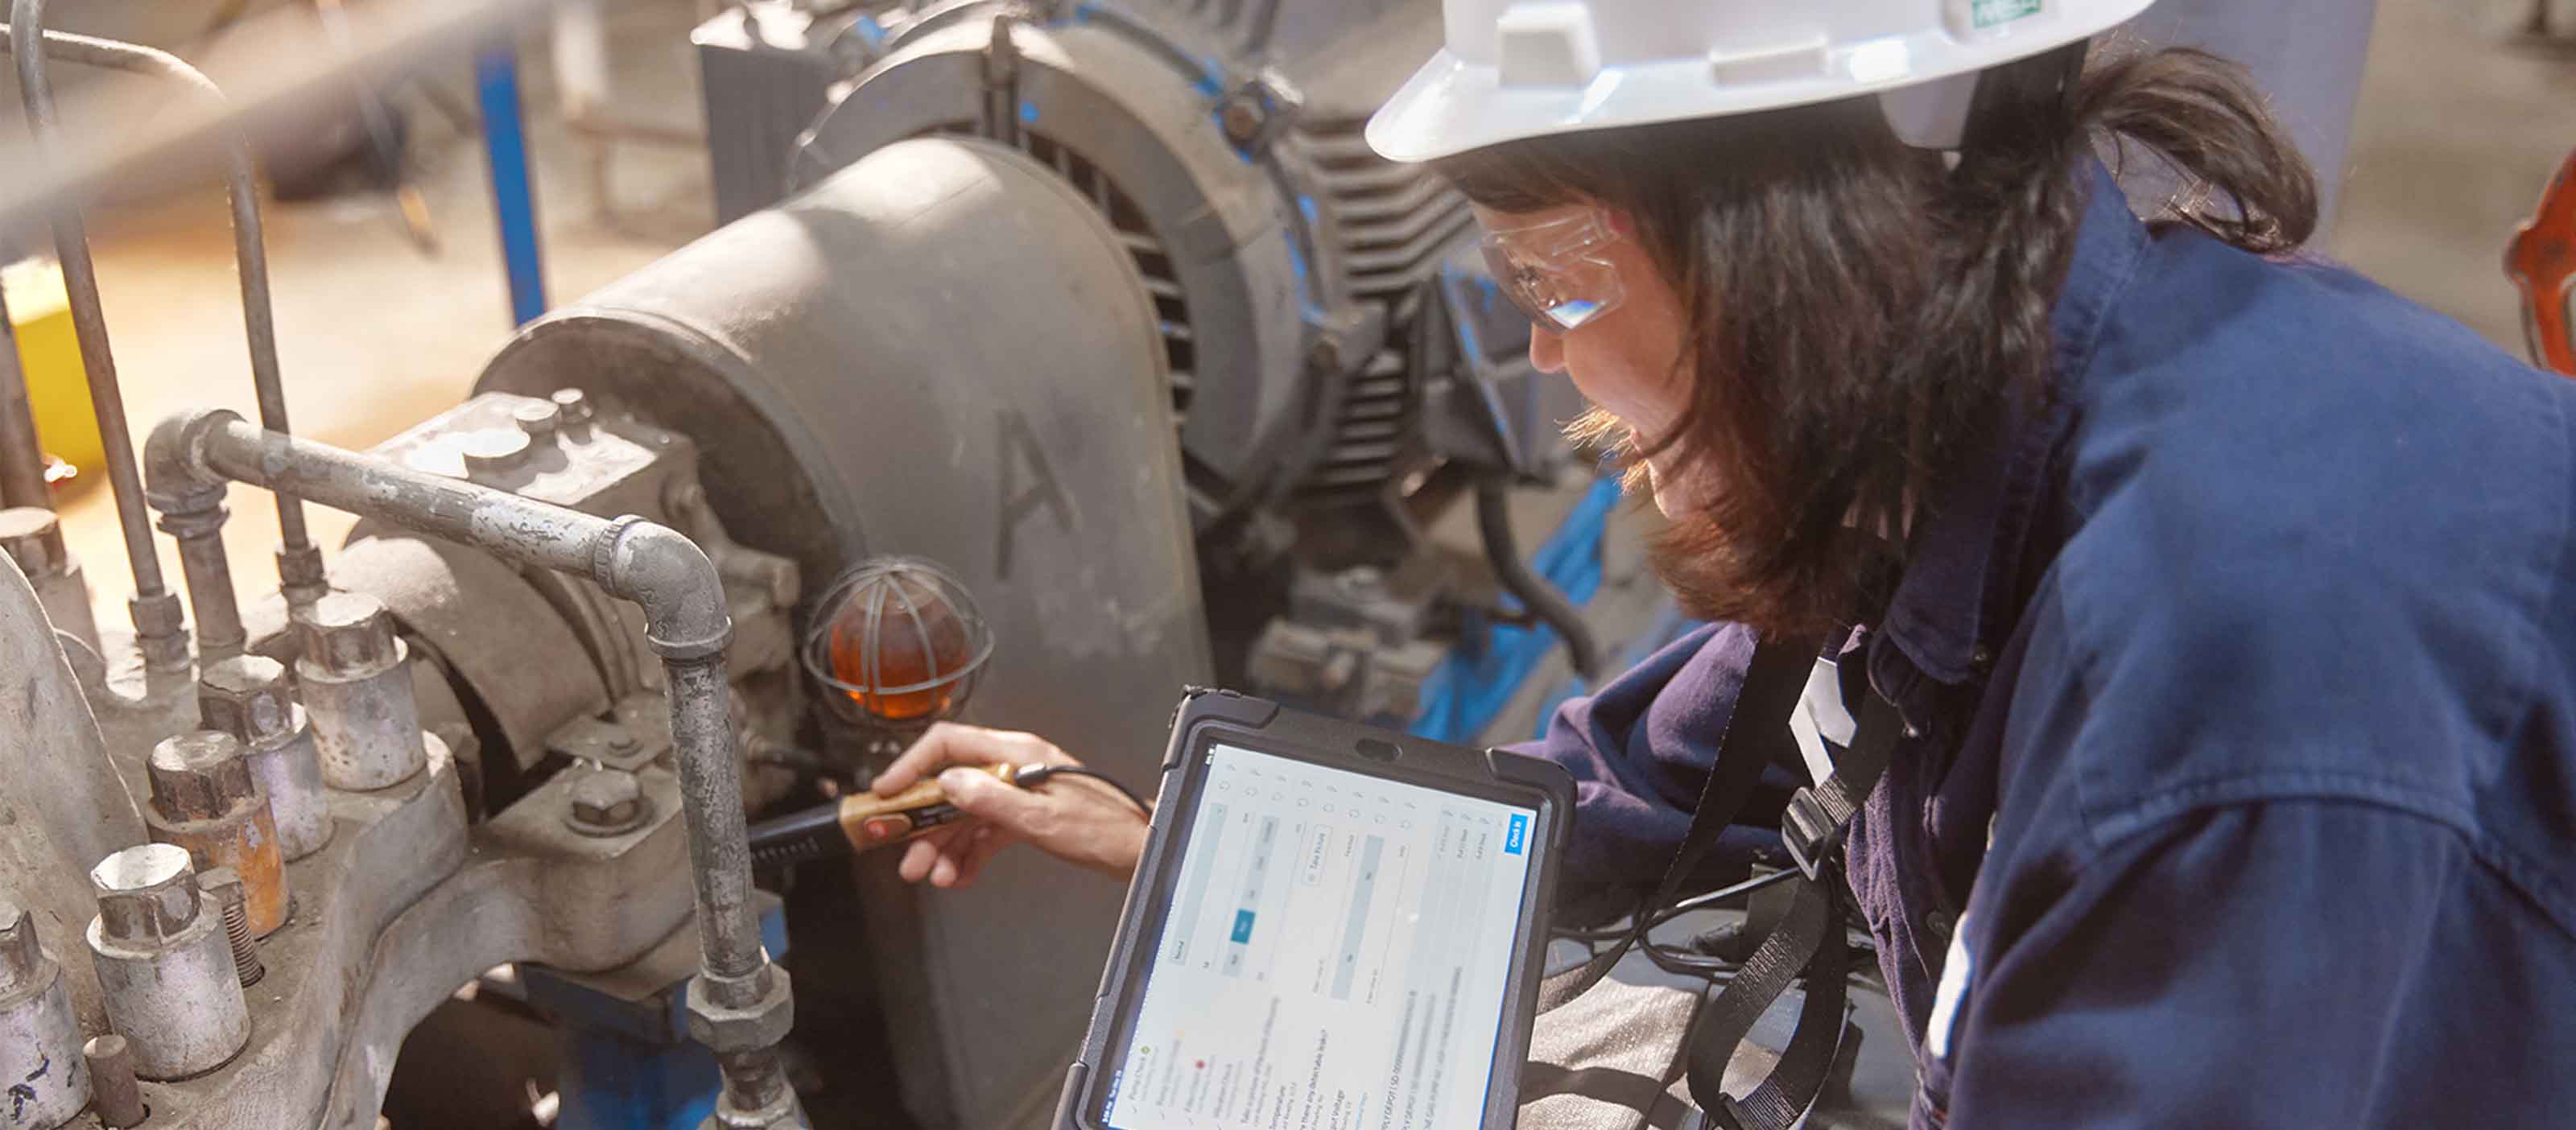 Maintenance on gas power plant using GE Digital software